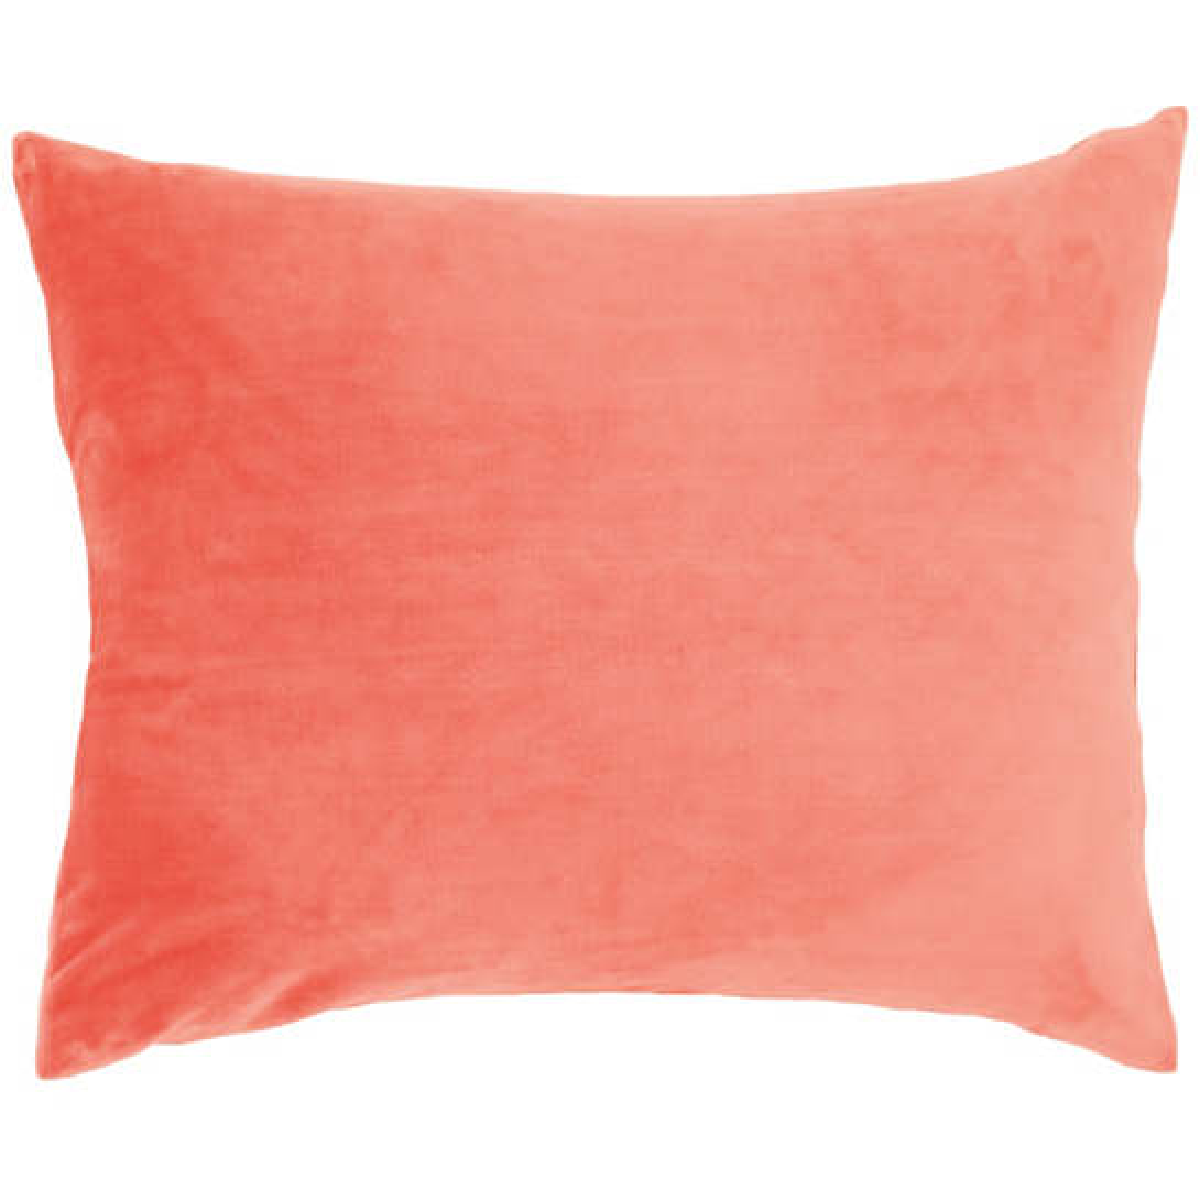 selke fleece coral decorative pillow - Coral Decorative Pillows